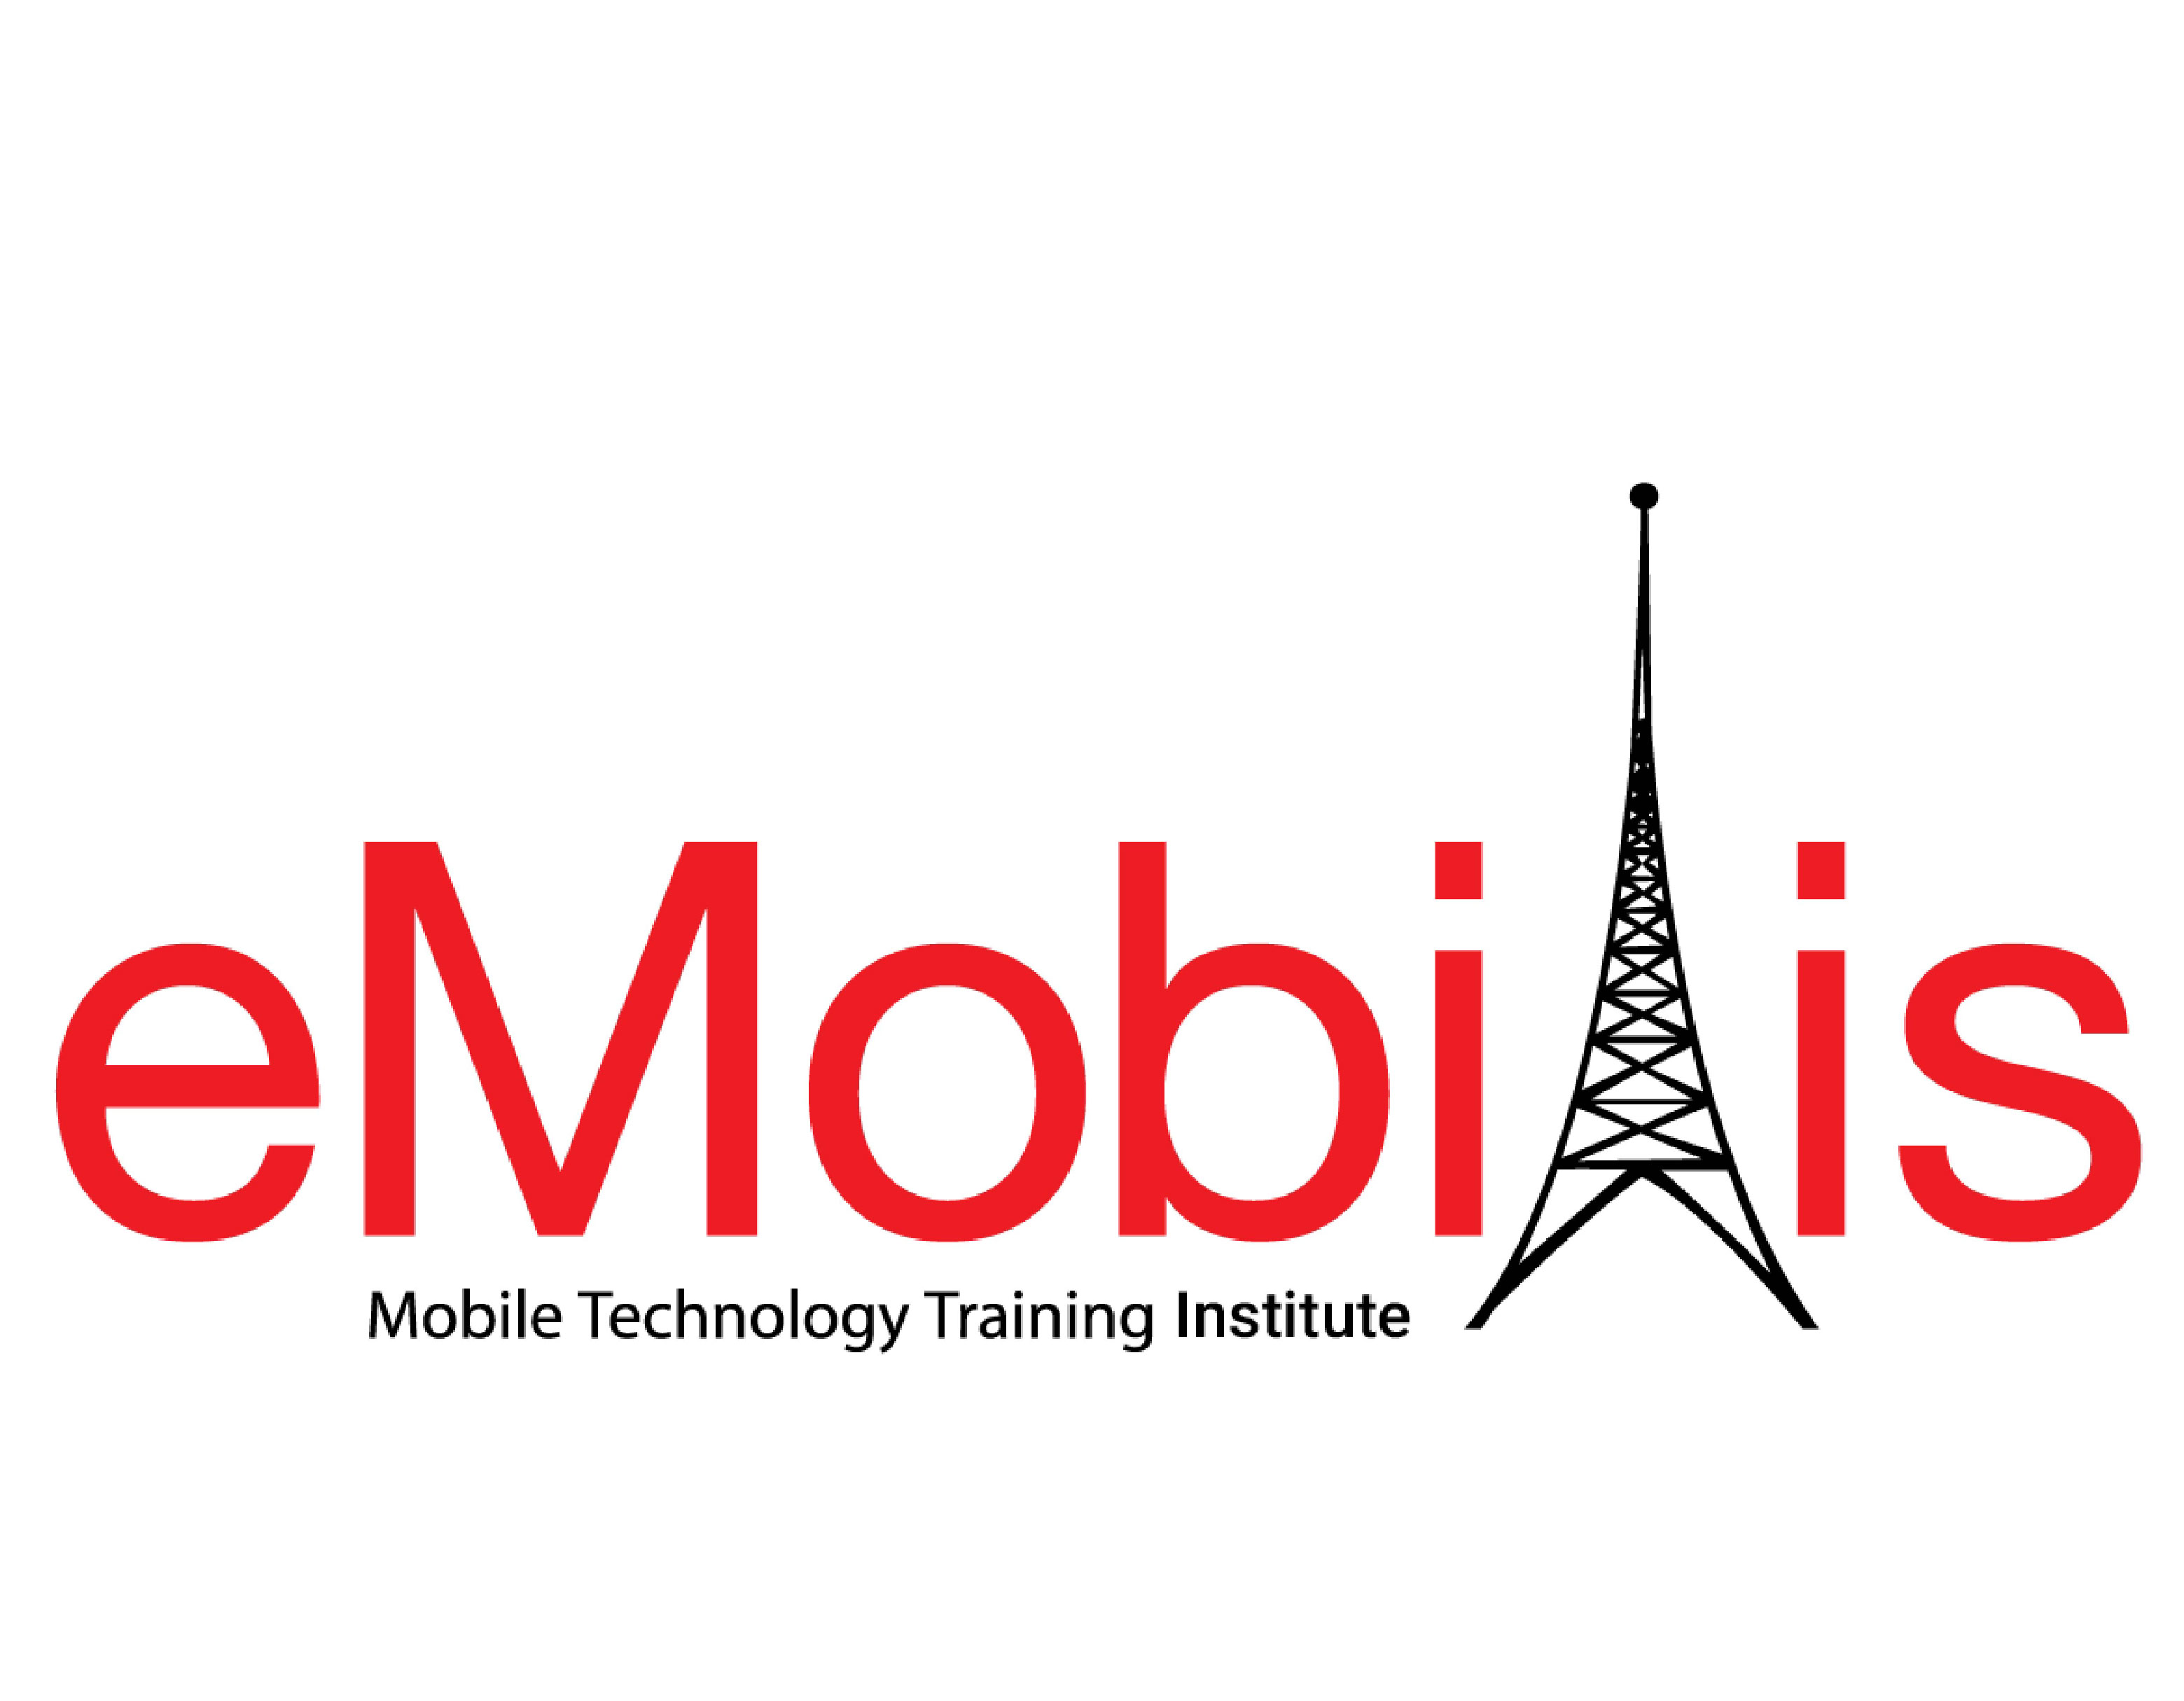 tactive consulting - emobilis logo resize 5